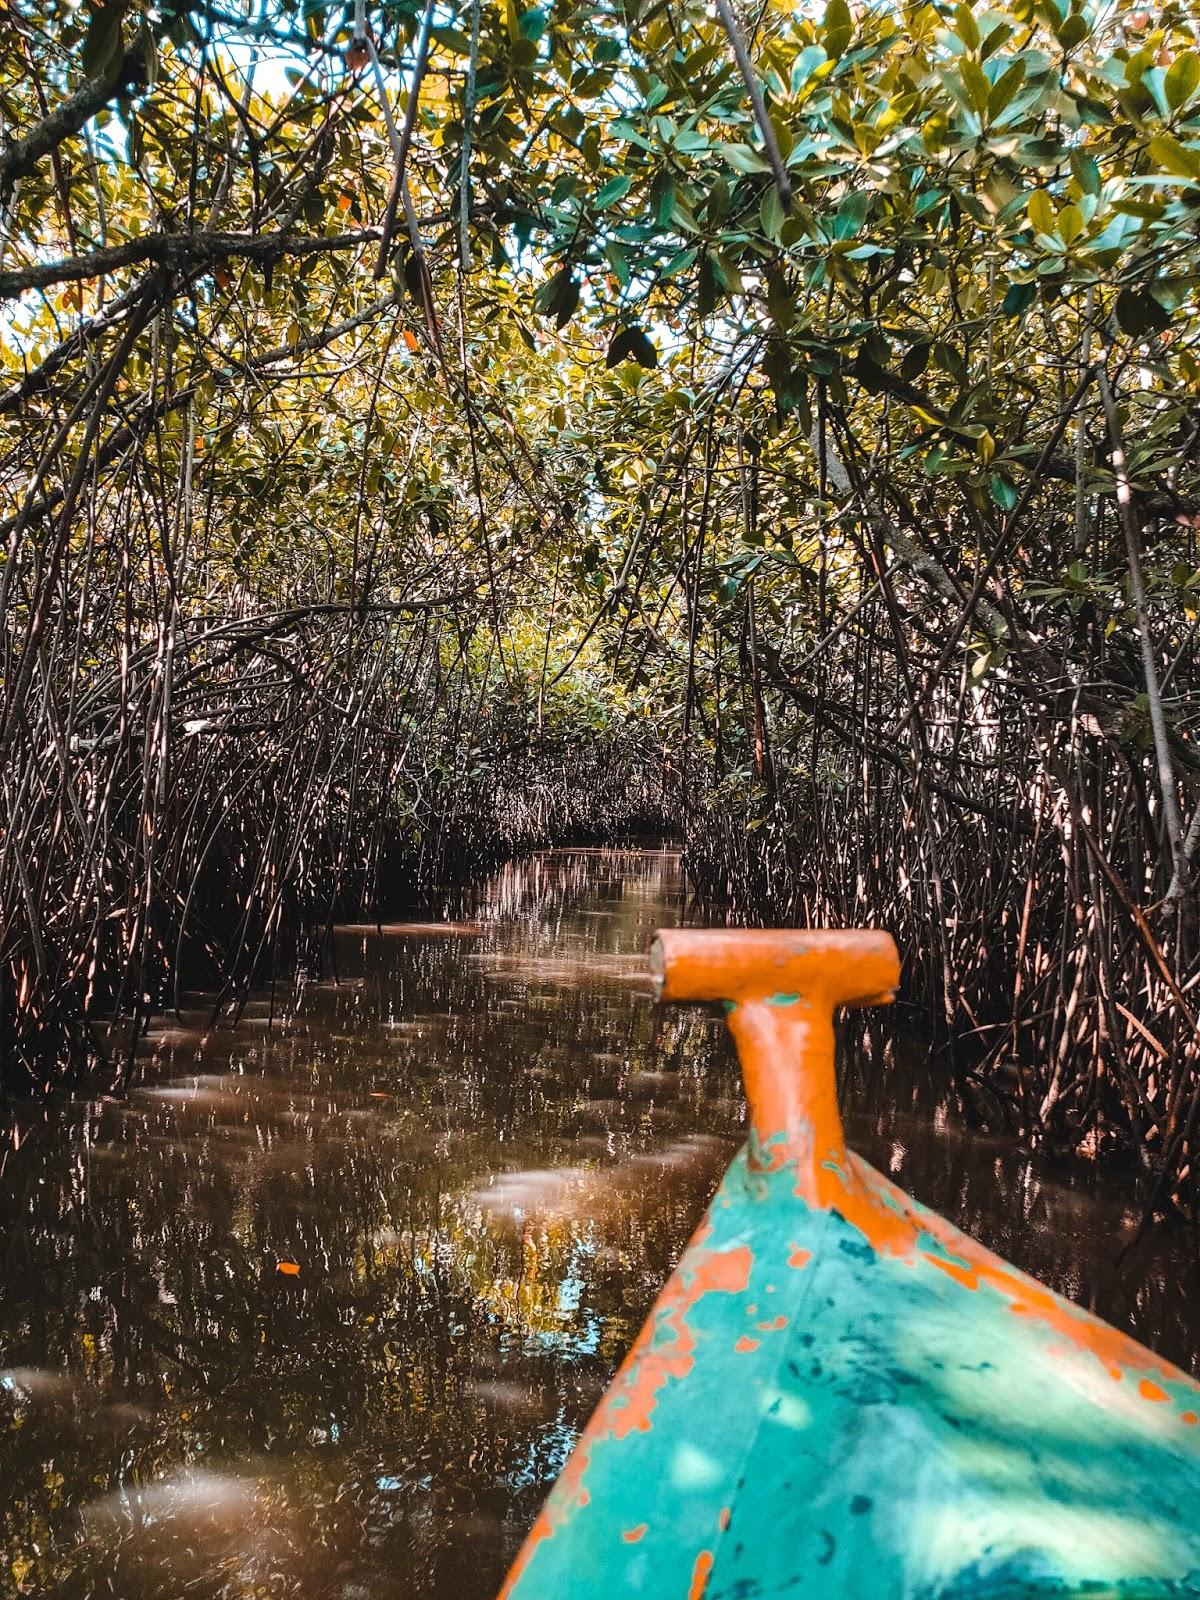 boat ride in pichavaram mangrove forest.